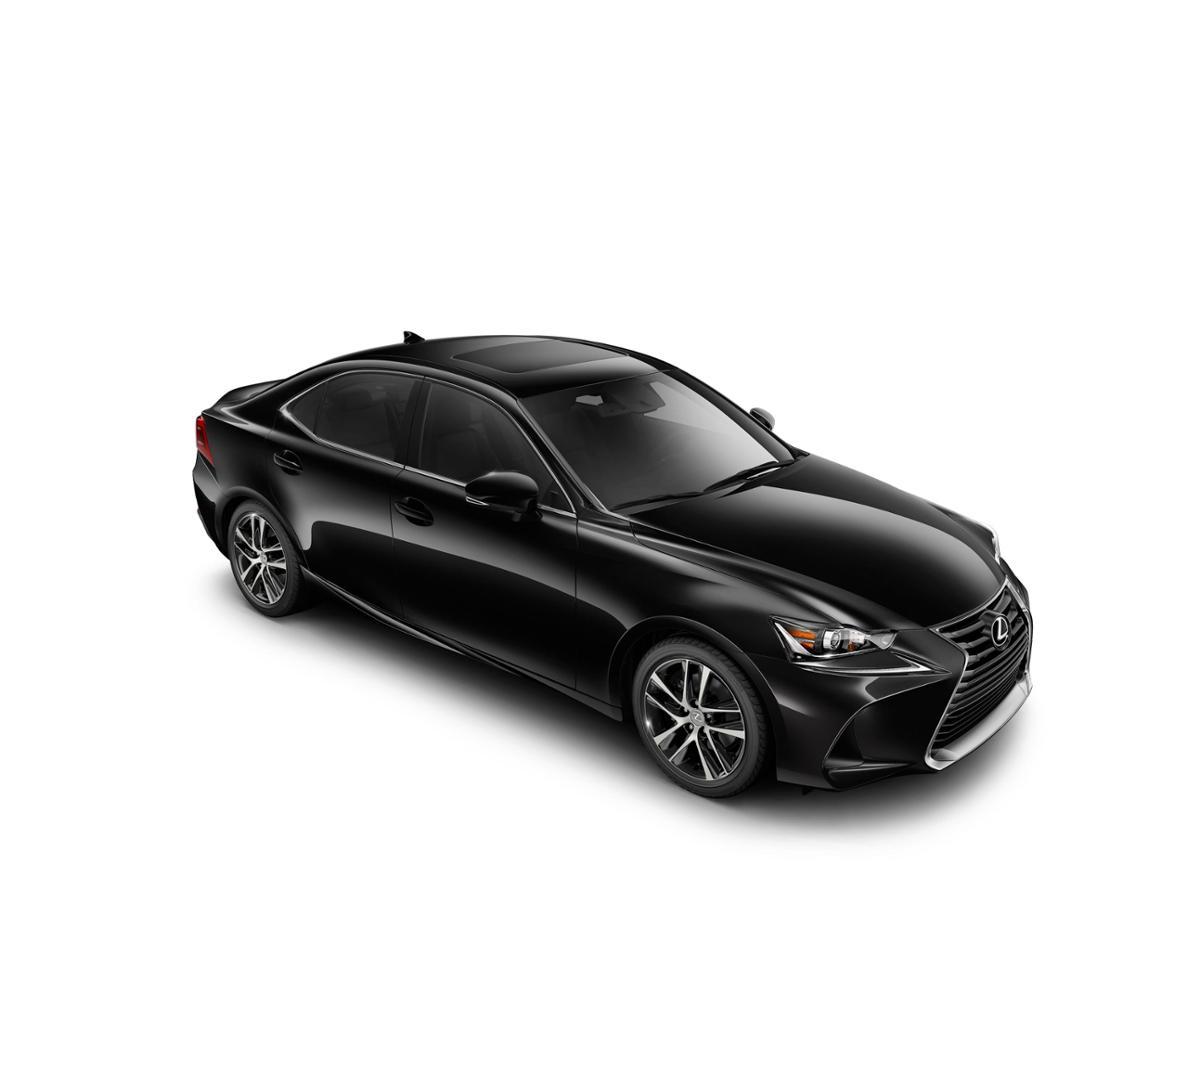 Lexus Of Memphis Used Cars: 2019 Lexus IS 300